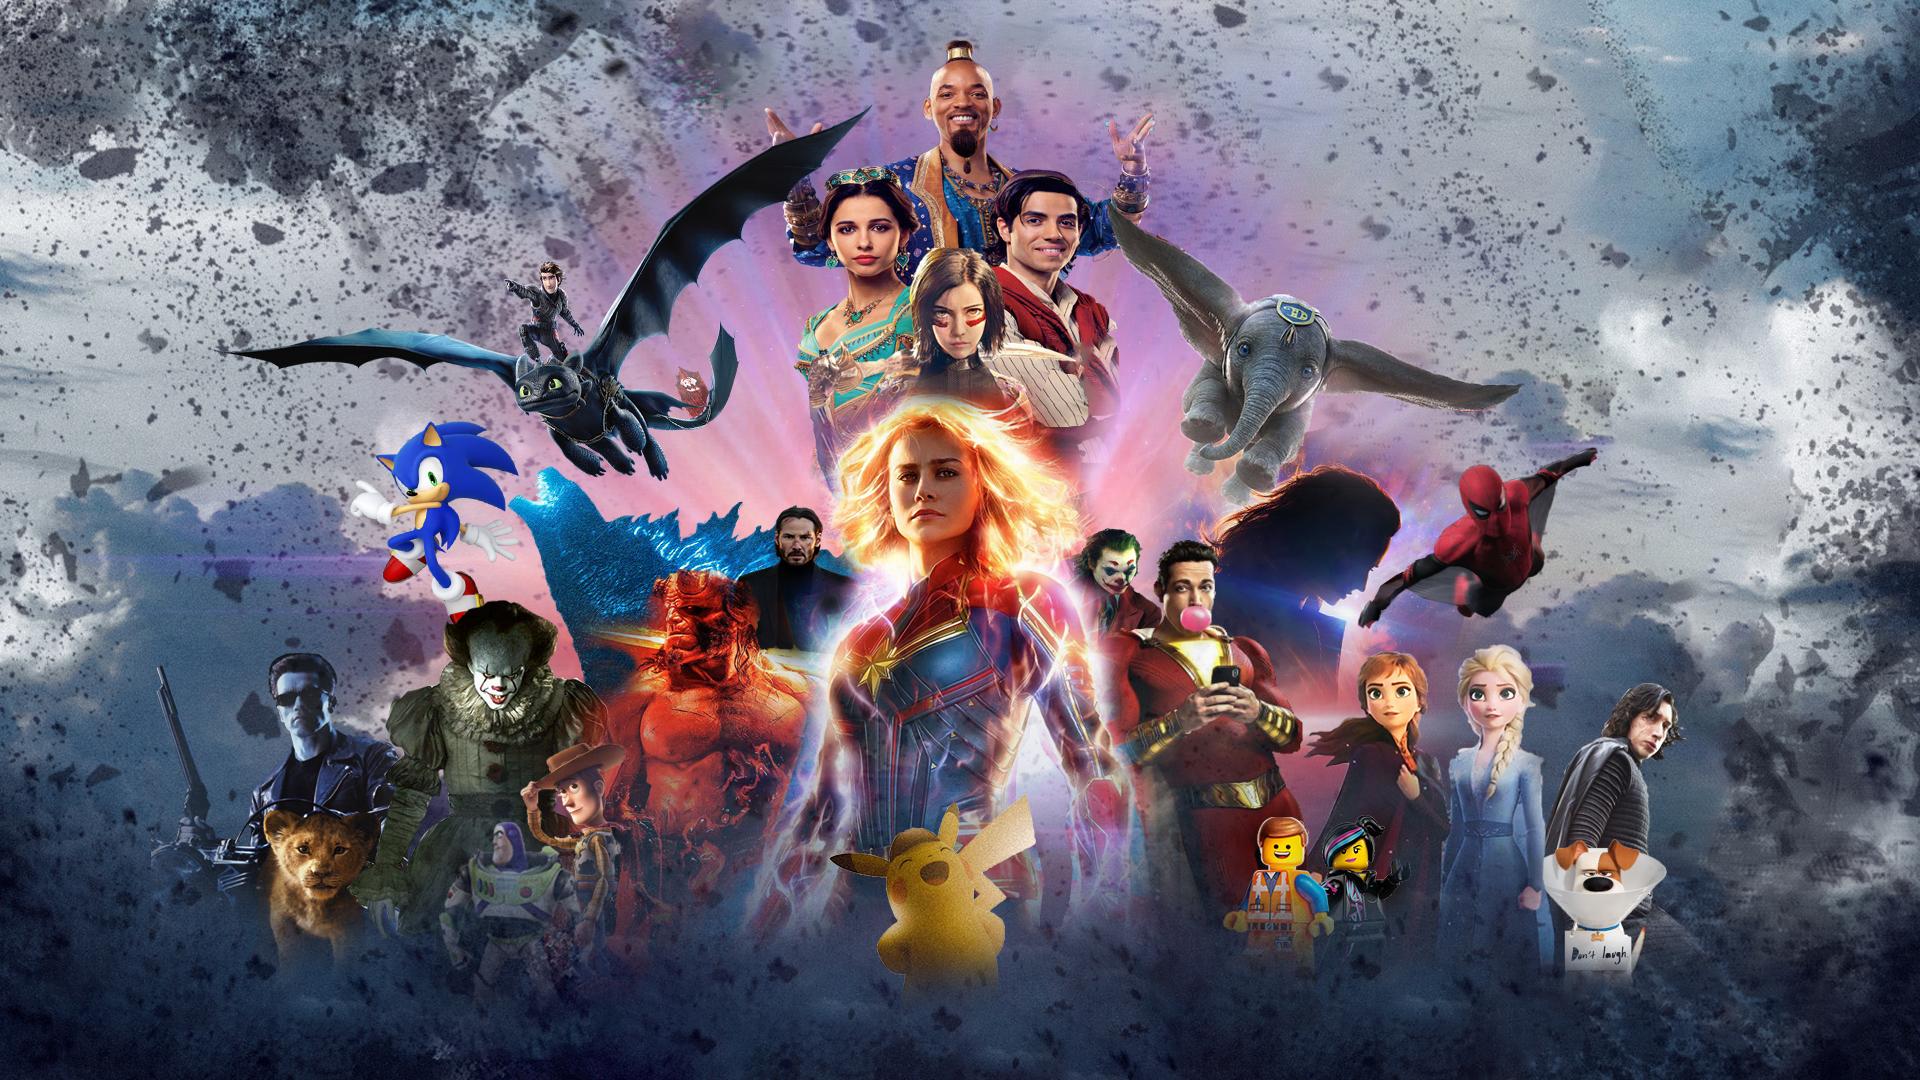 2019 Movies Wallpaper By The Dark Mamba 995 On Deviantart